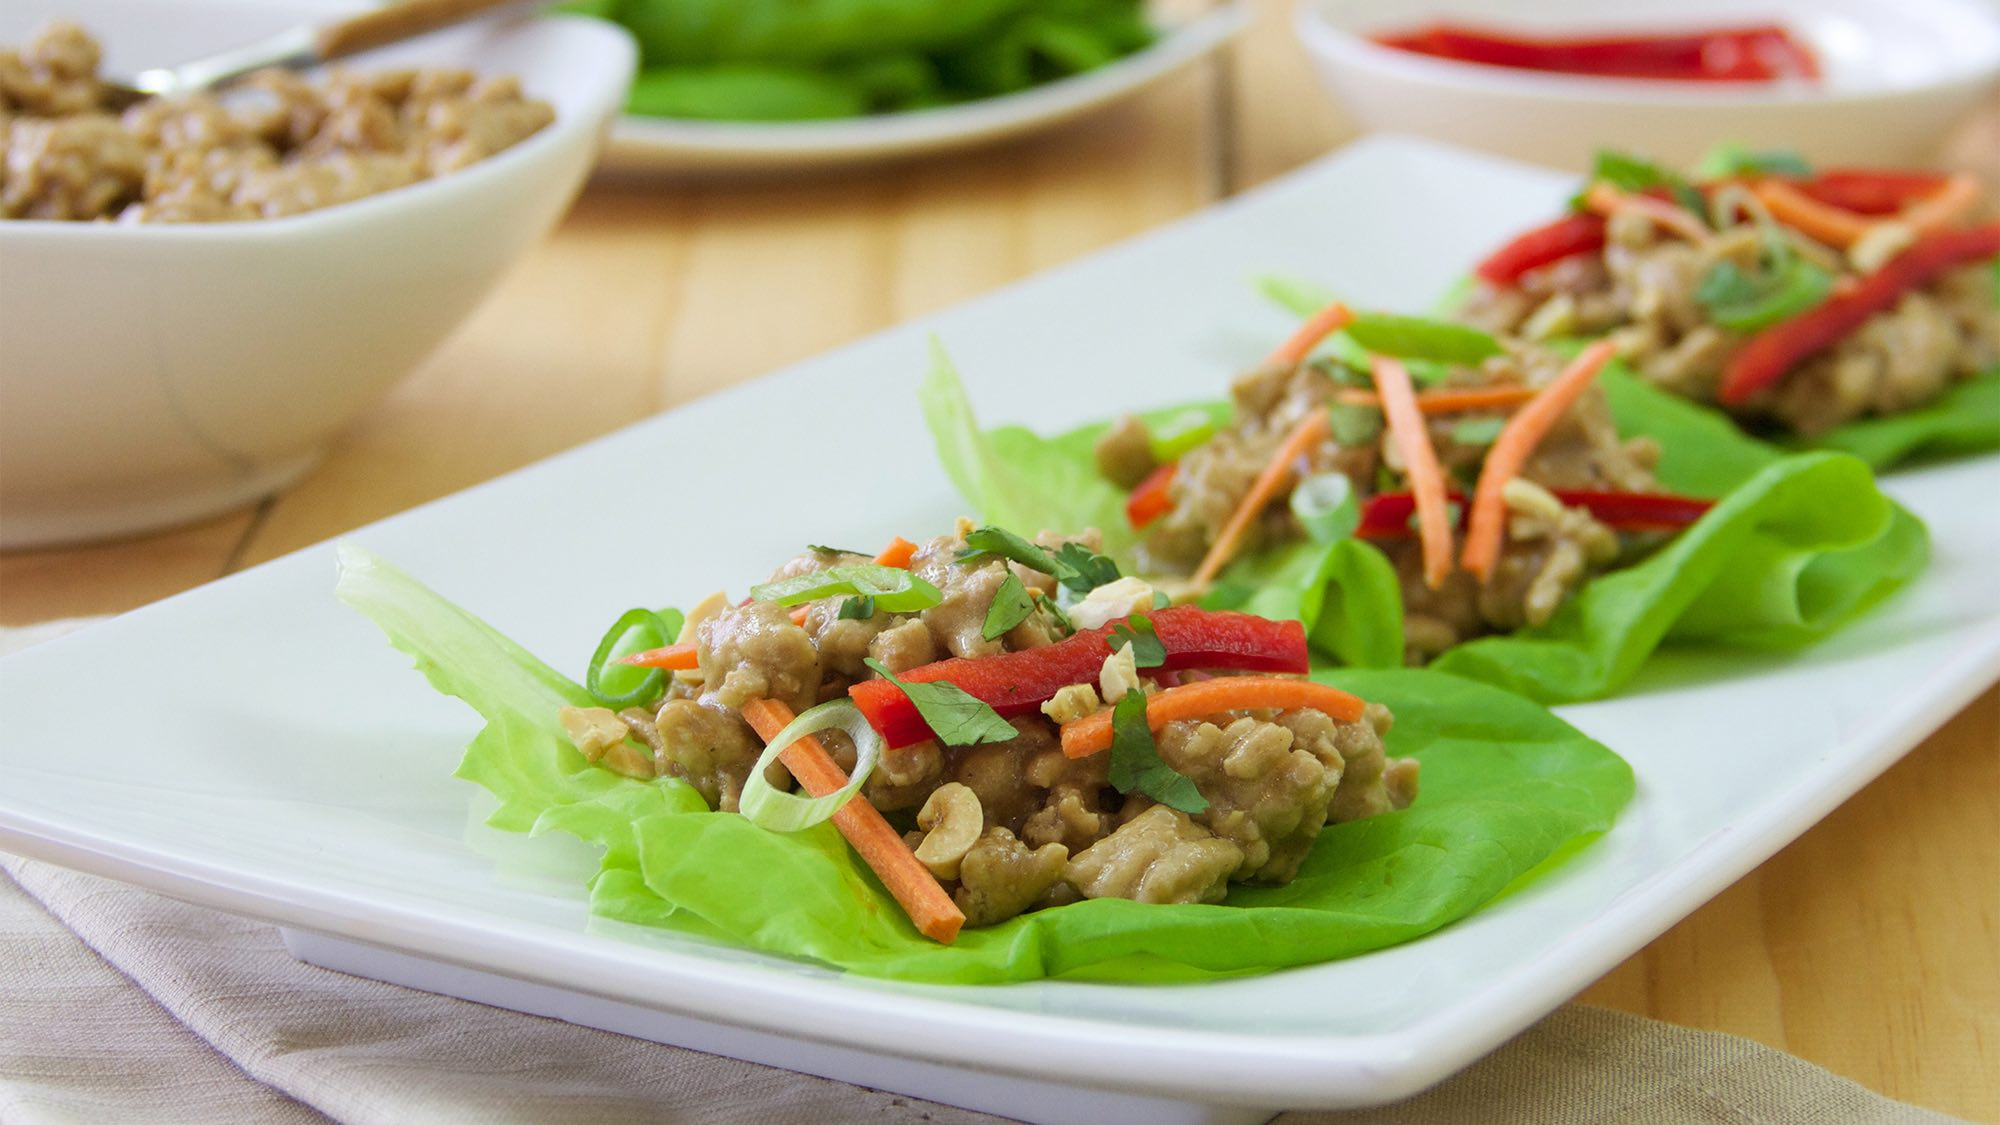 McCormick Gluten Free Asian Style Chicken Wraps